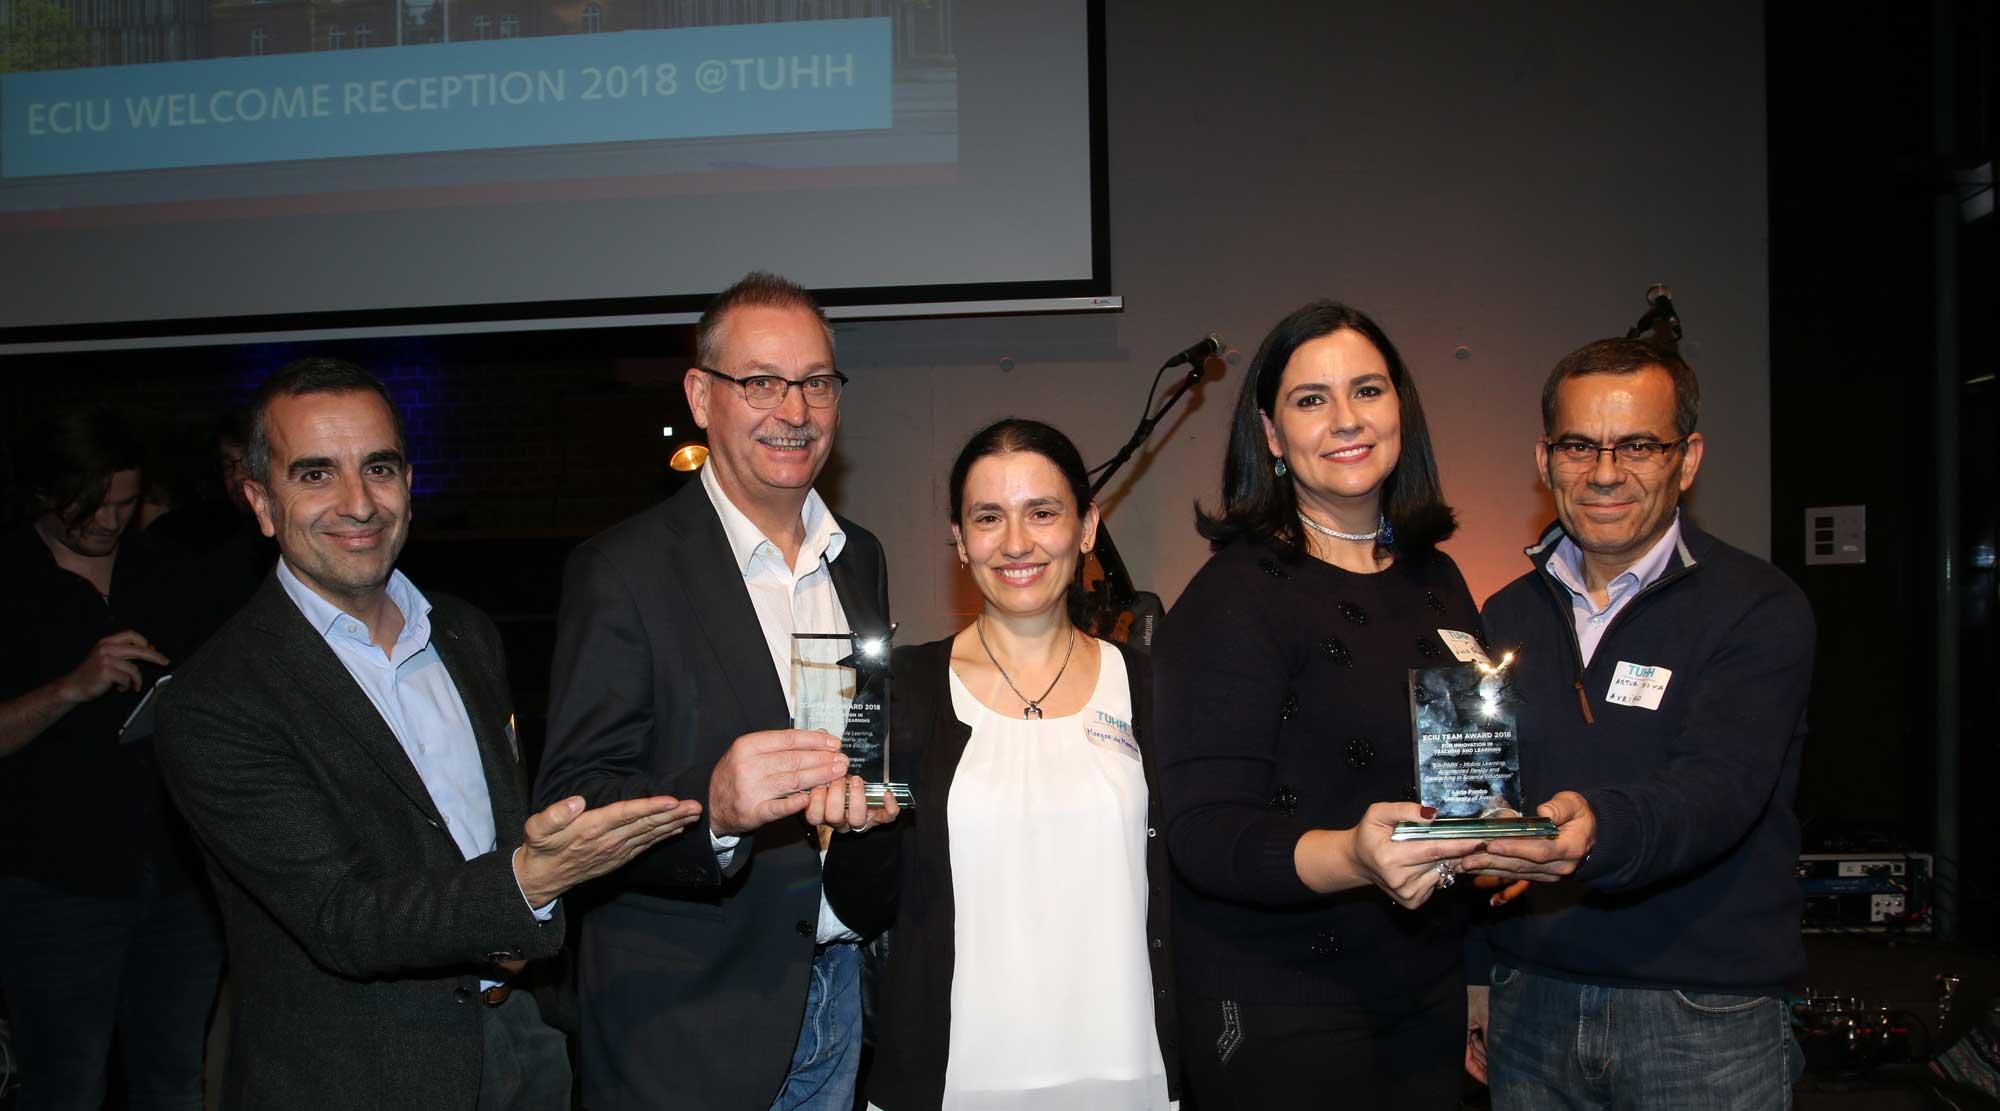 University of Aveiro Project wins the ECIU Team Award